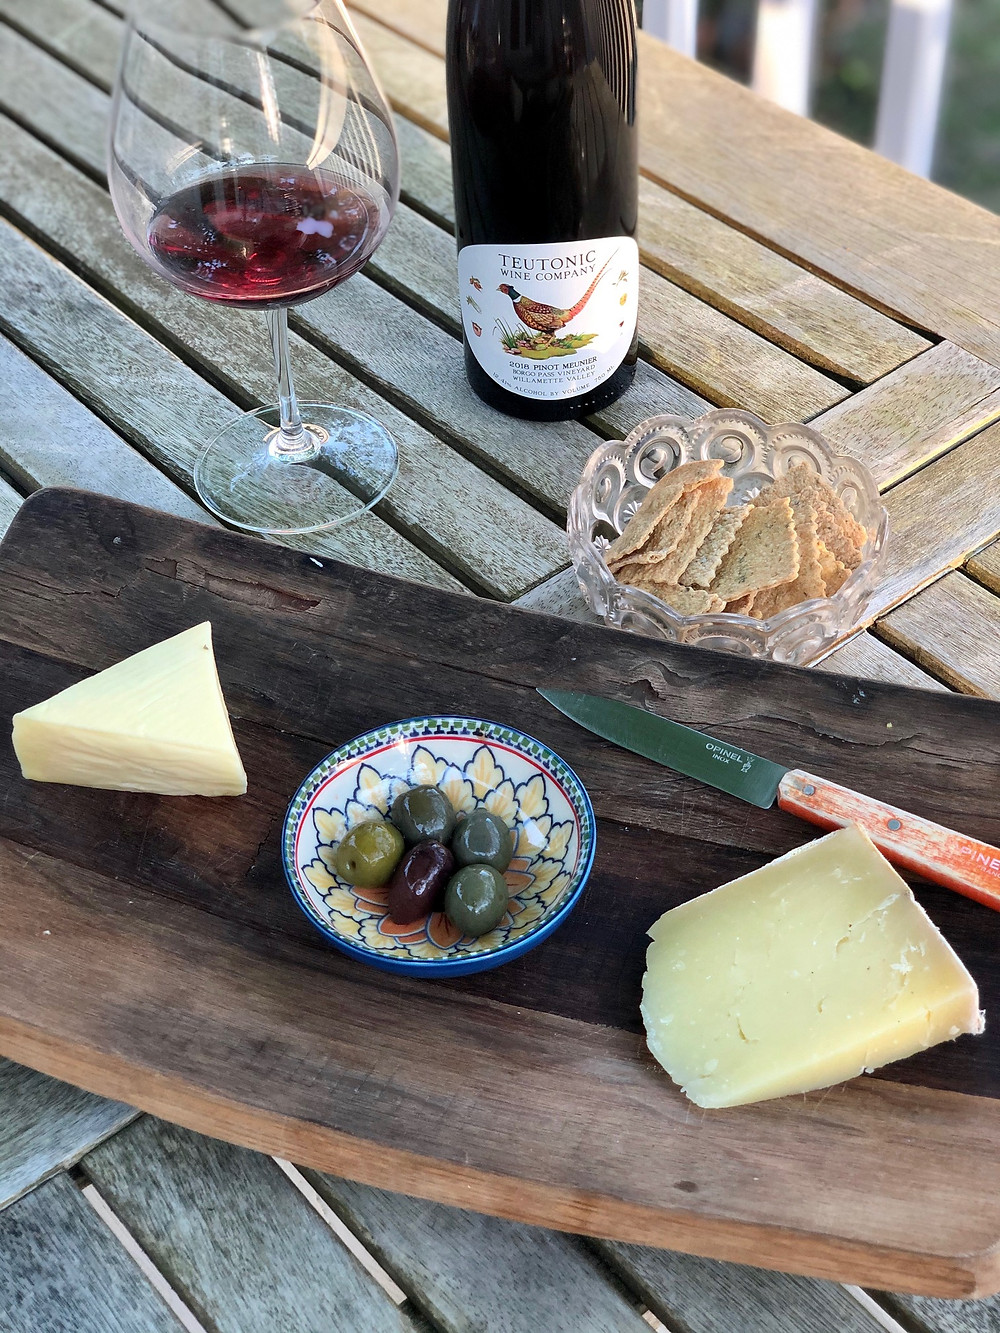 Teutonic Pinot Meunier, natural wine from Oregon, cheese board, cherishing precious moments during COVID crisis